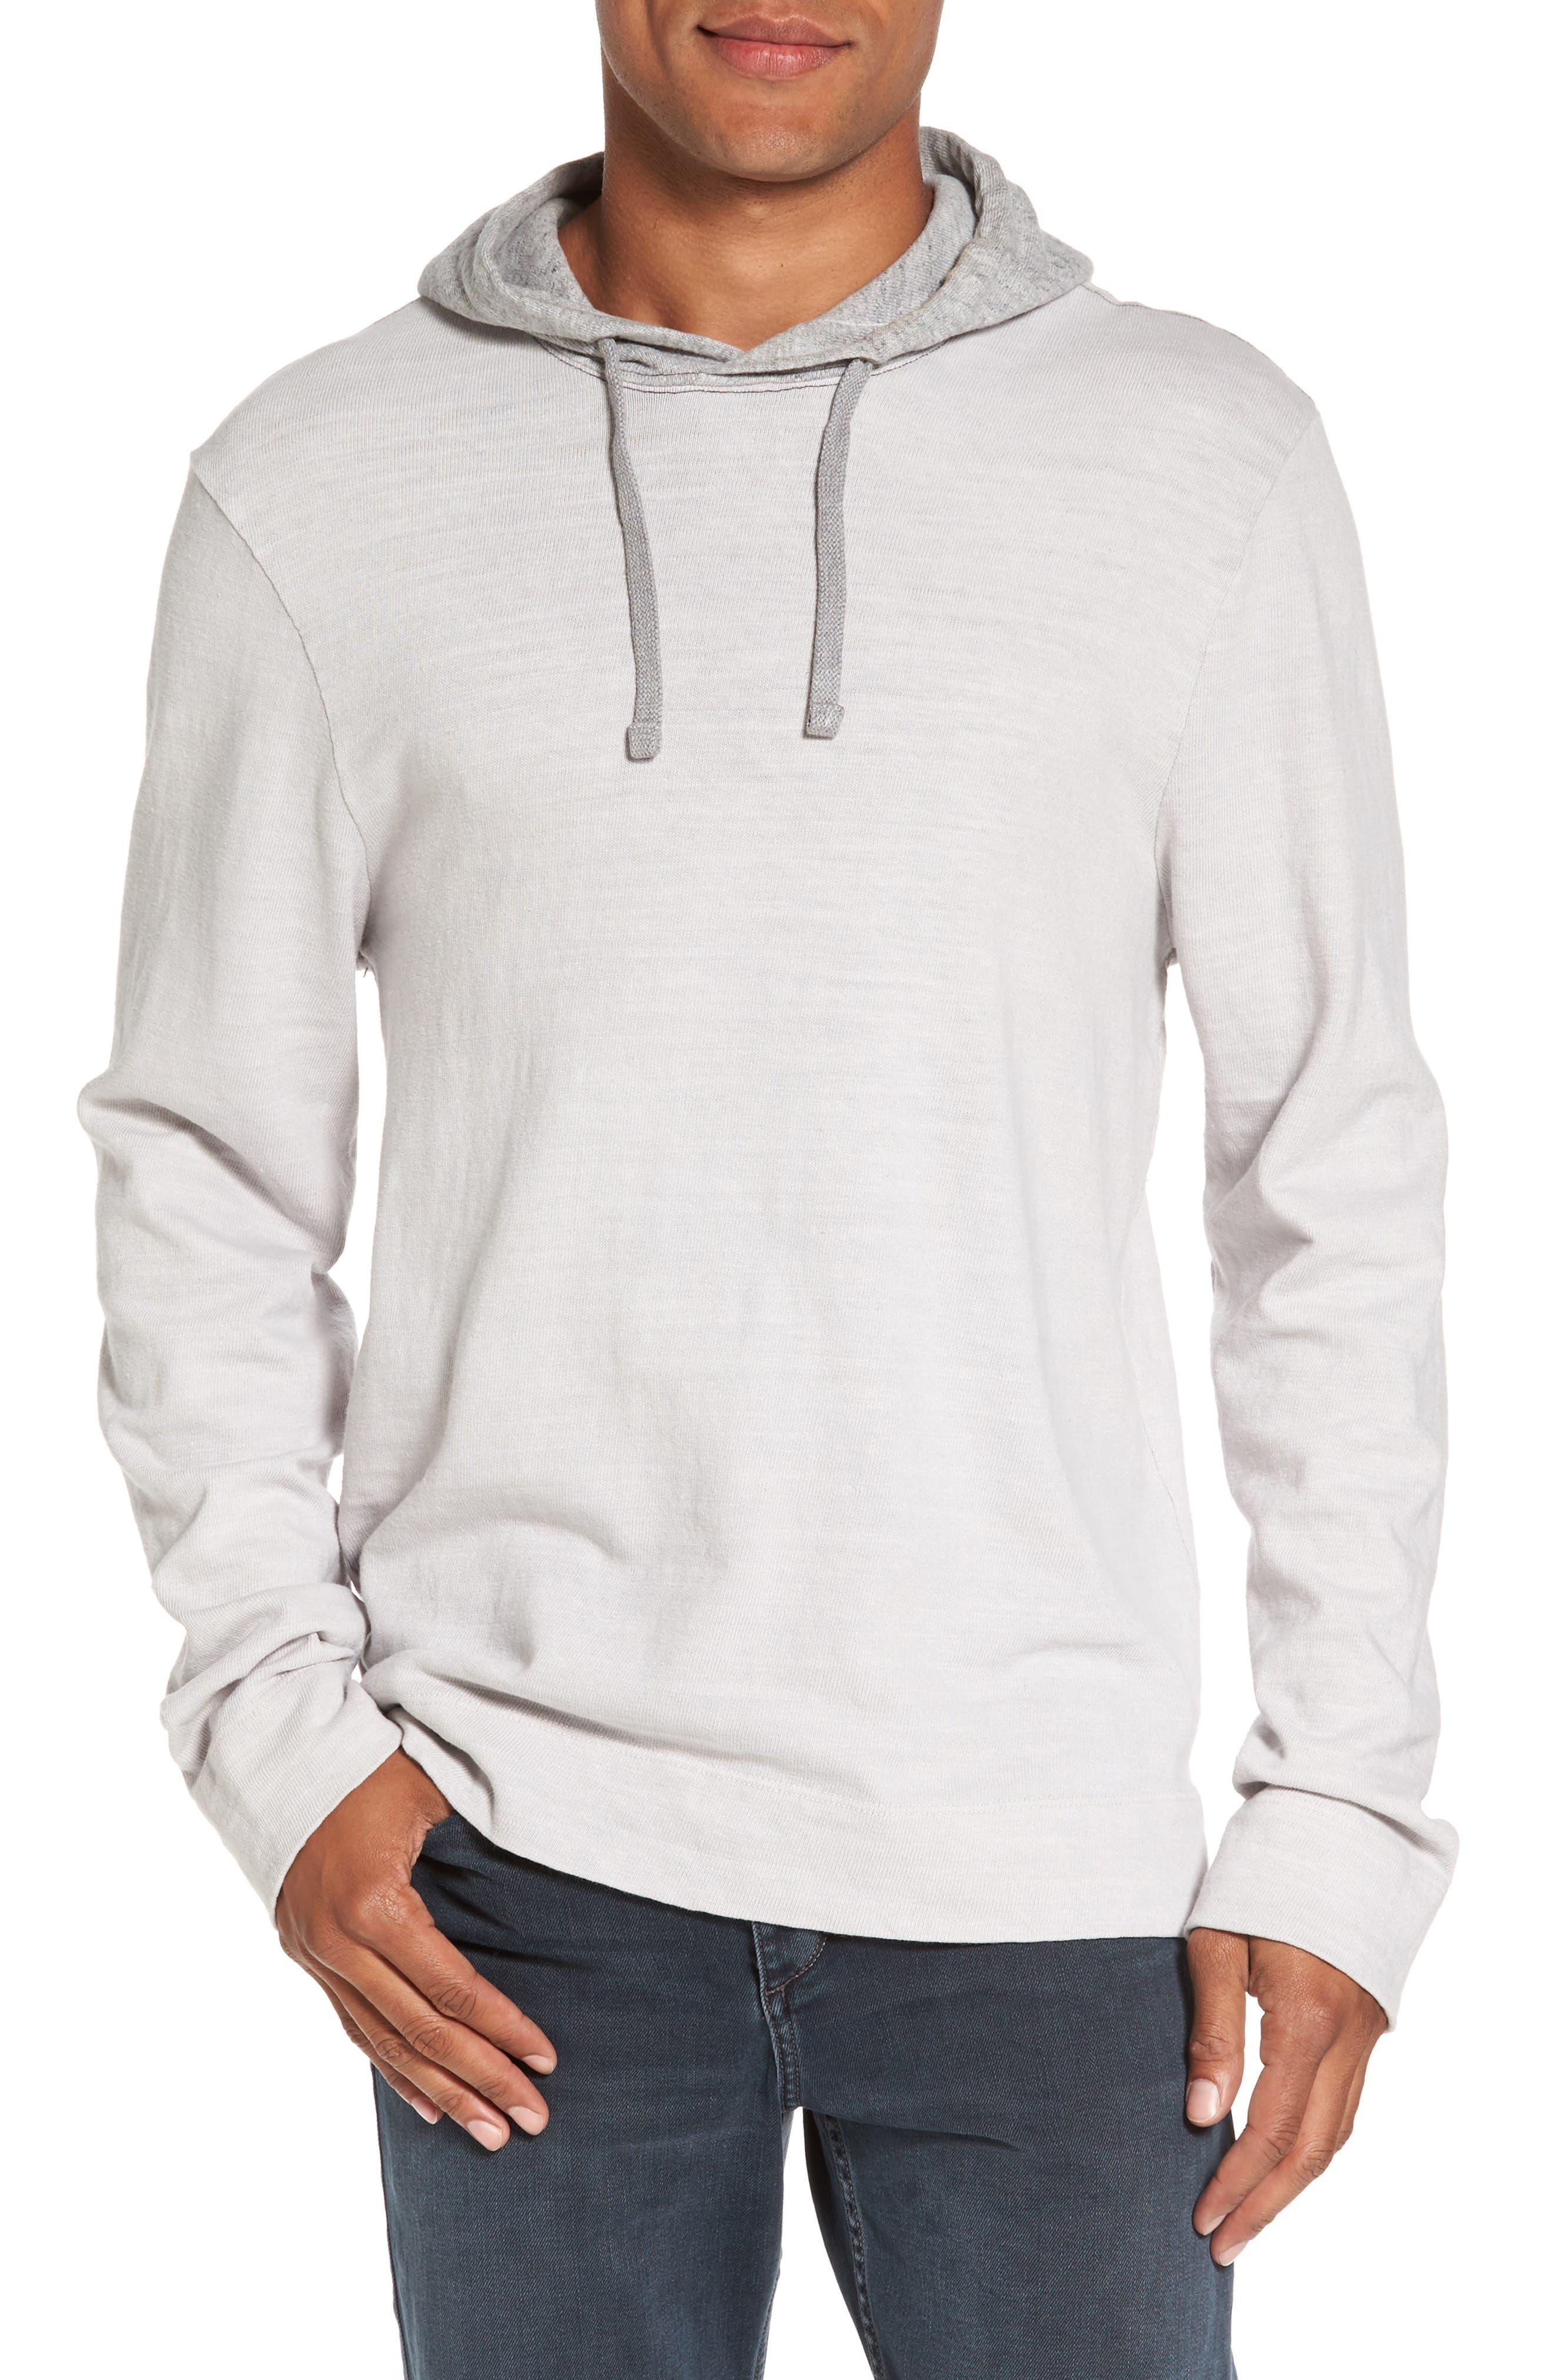 Alternate Image 1 Selected - James Perse Standard Fit Pullover Hoodie